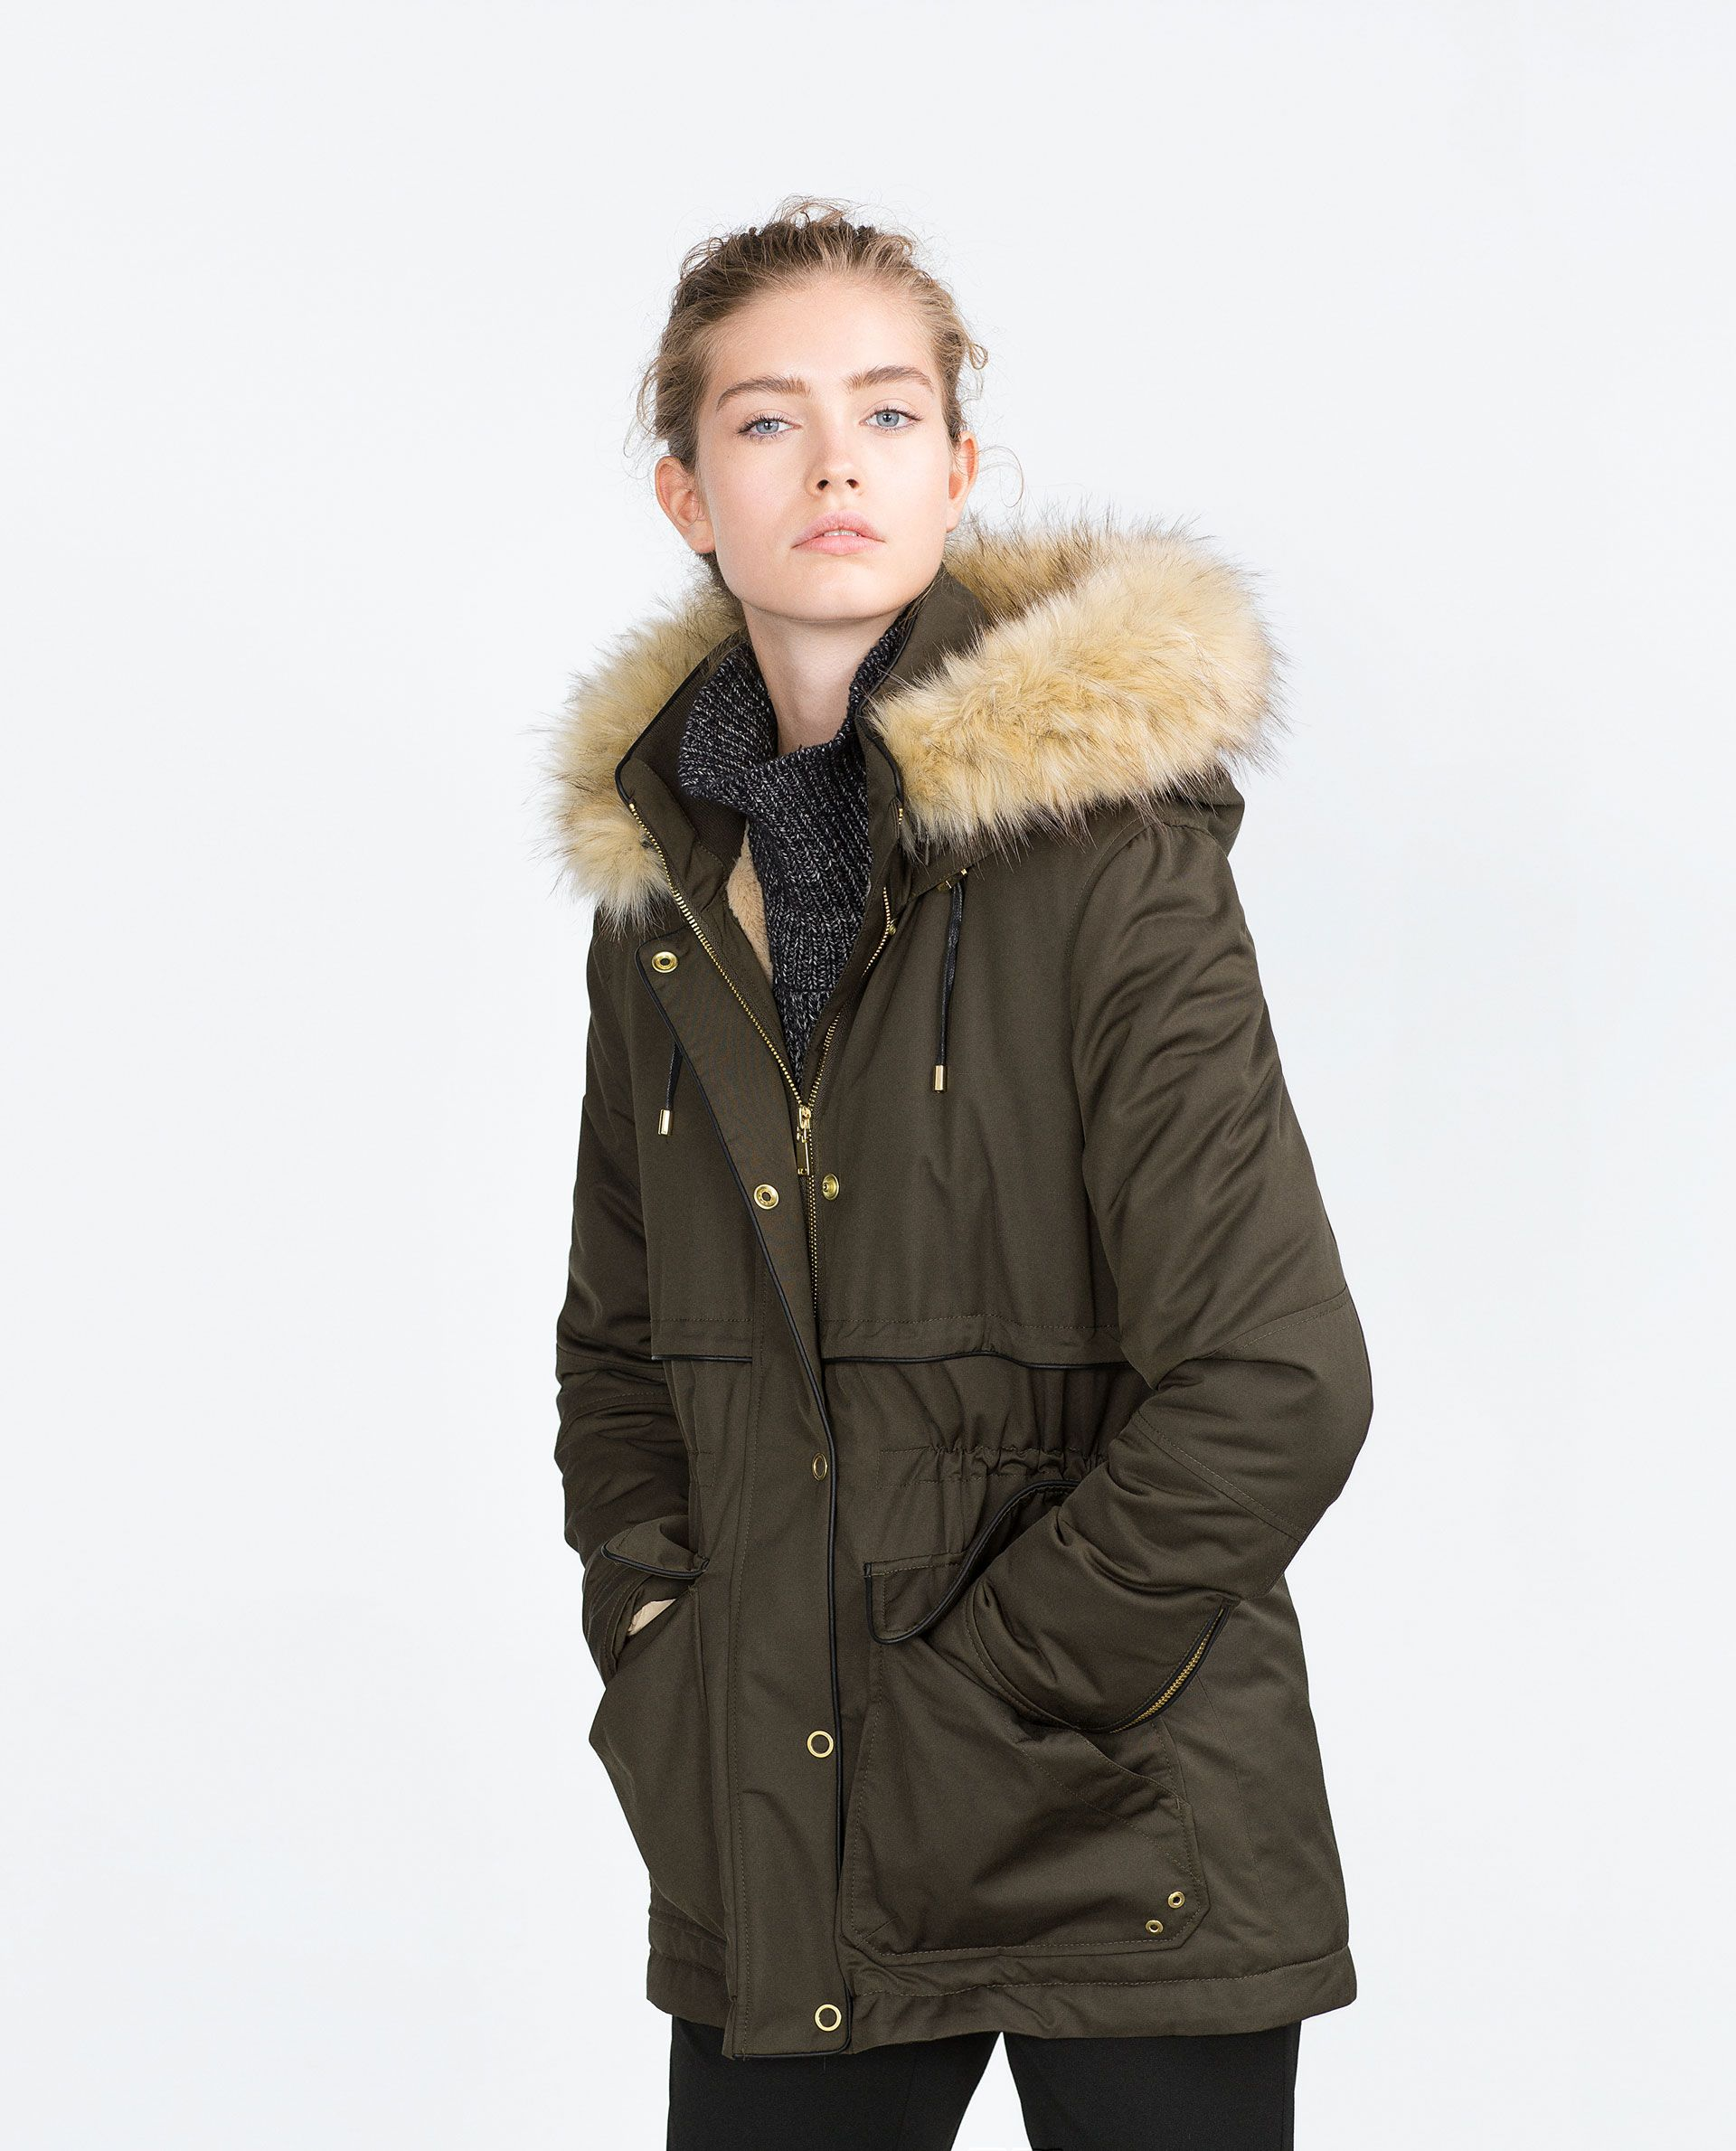 Manteau hiver femme grand col